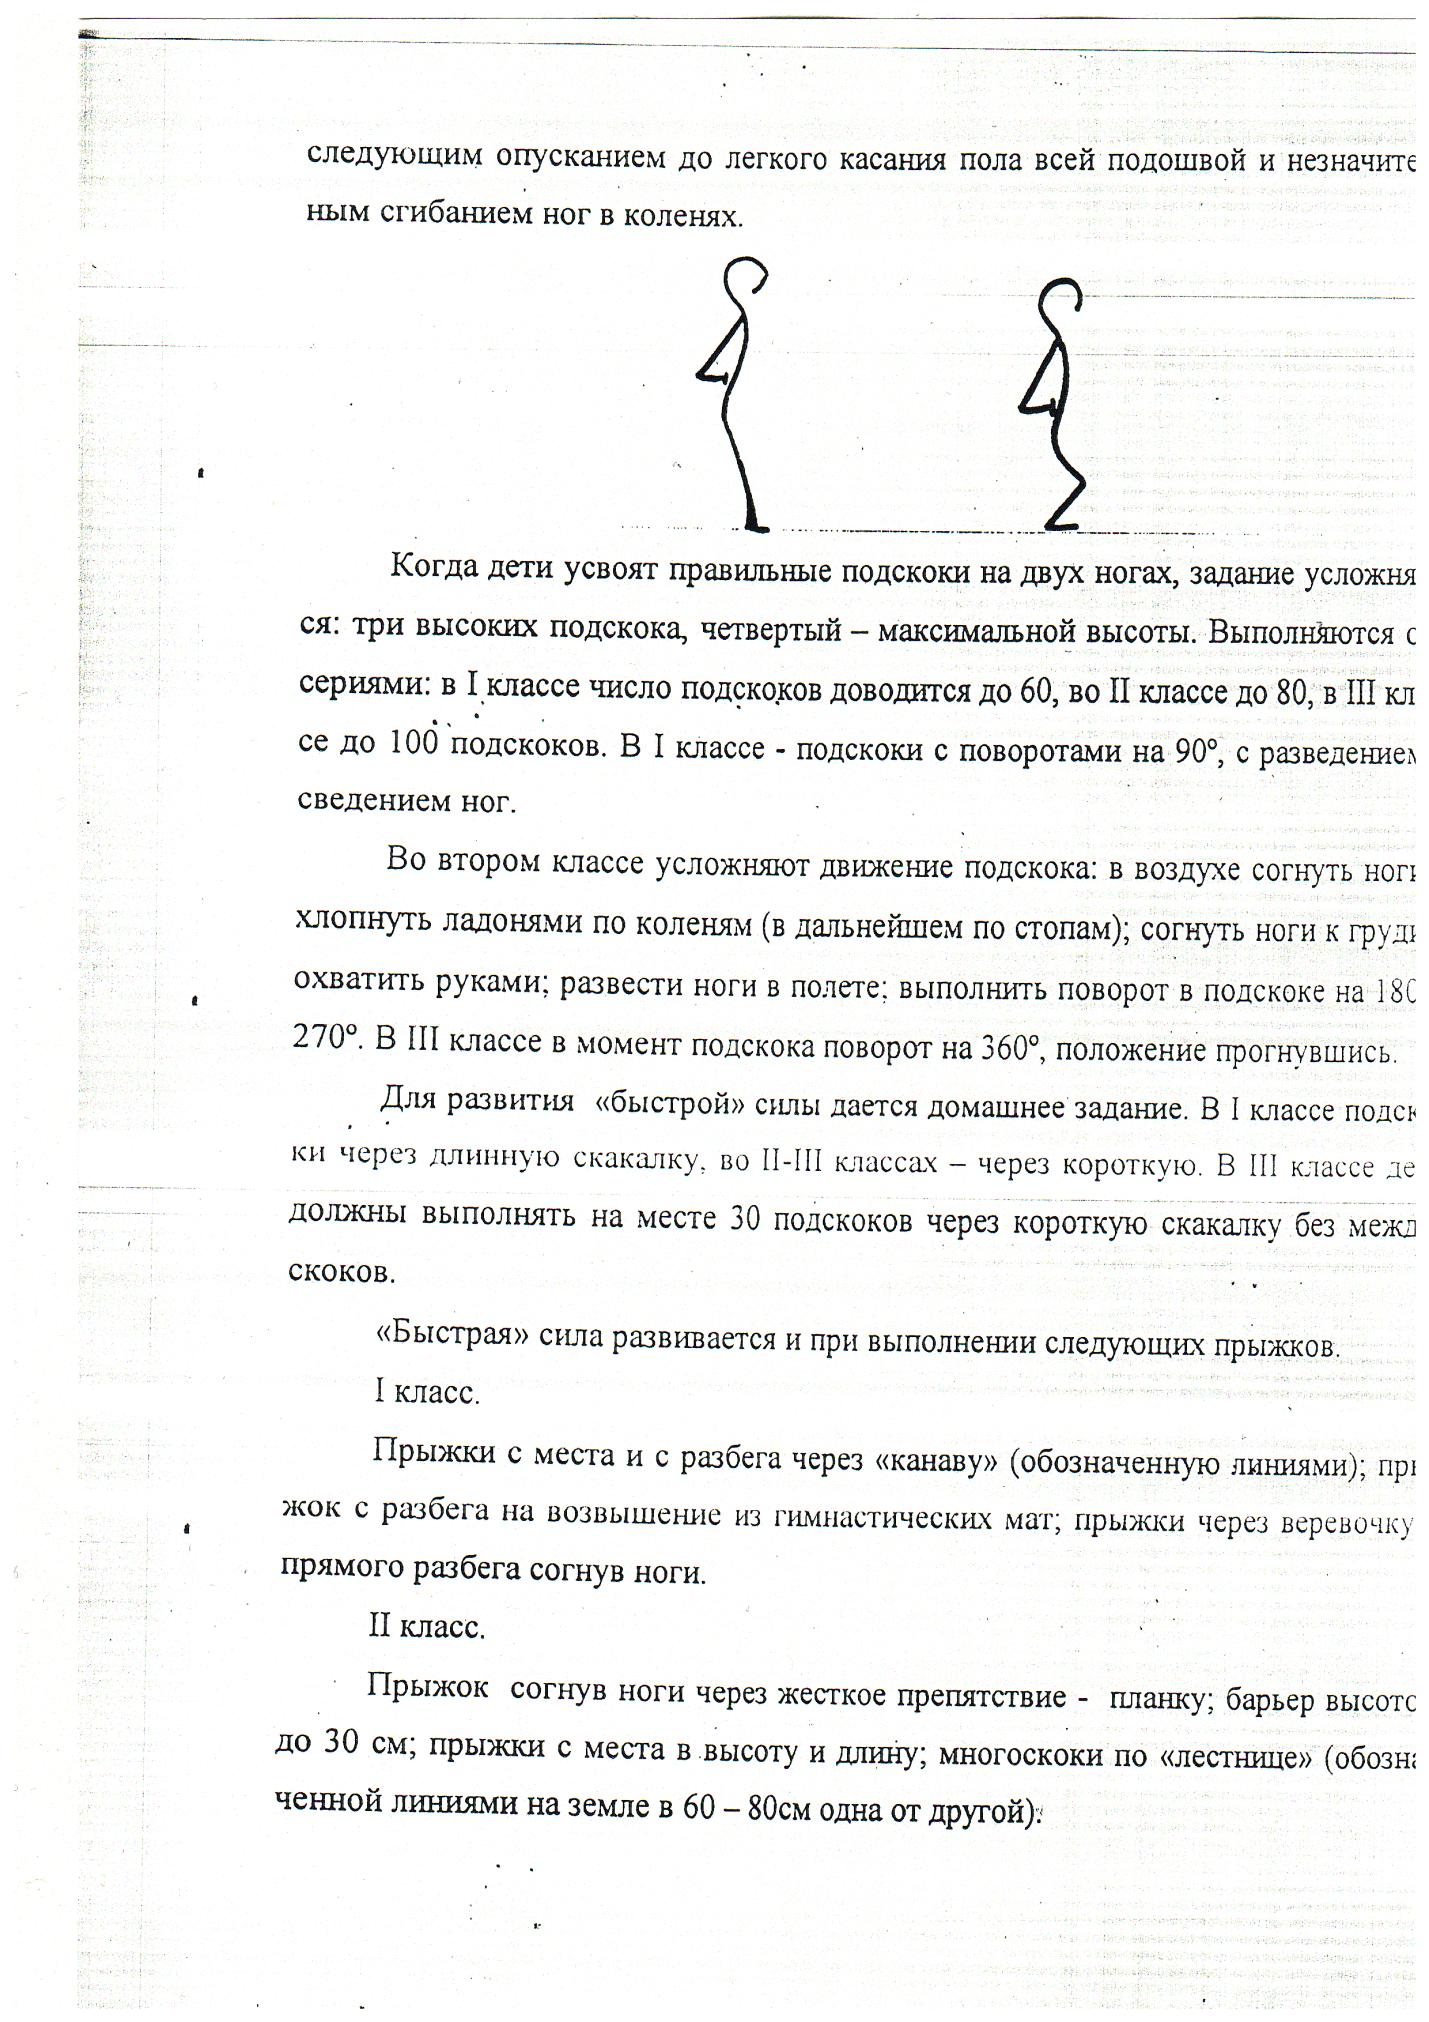 C:\Users\Татьяна\Desktop\9 001.BMP